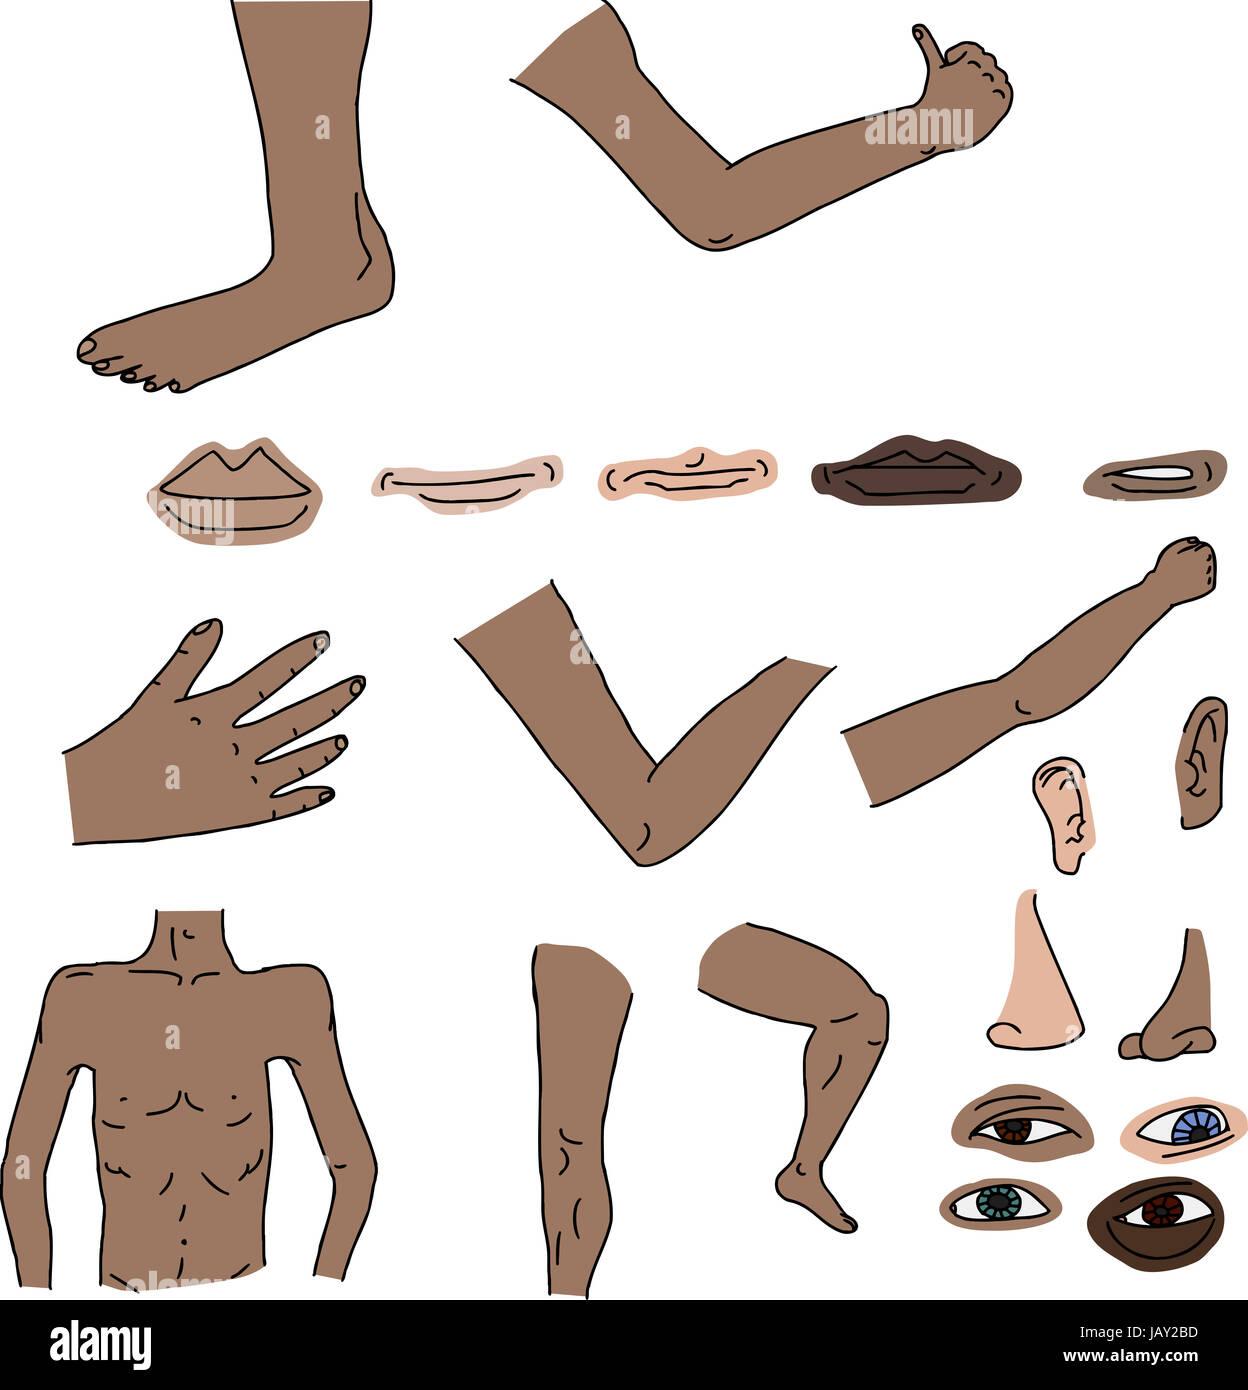 Body Parts Nose Illustration Human Stockfotos & Body Parts Nose ...